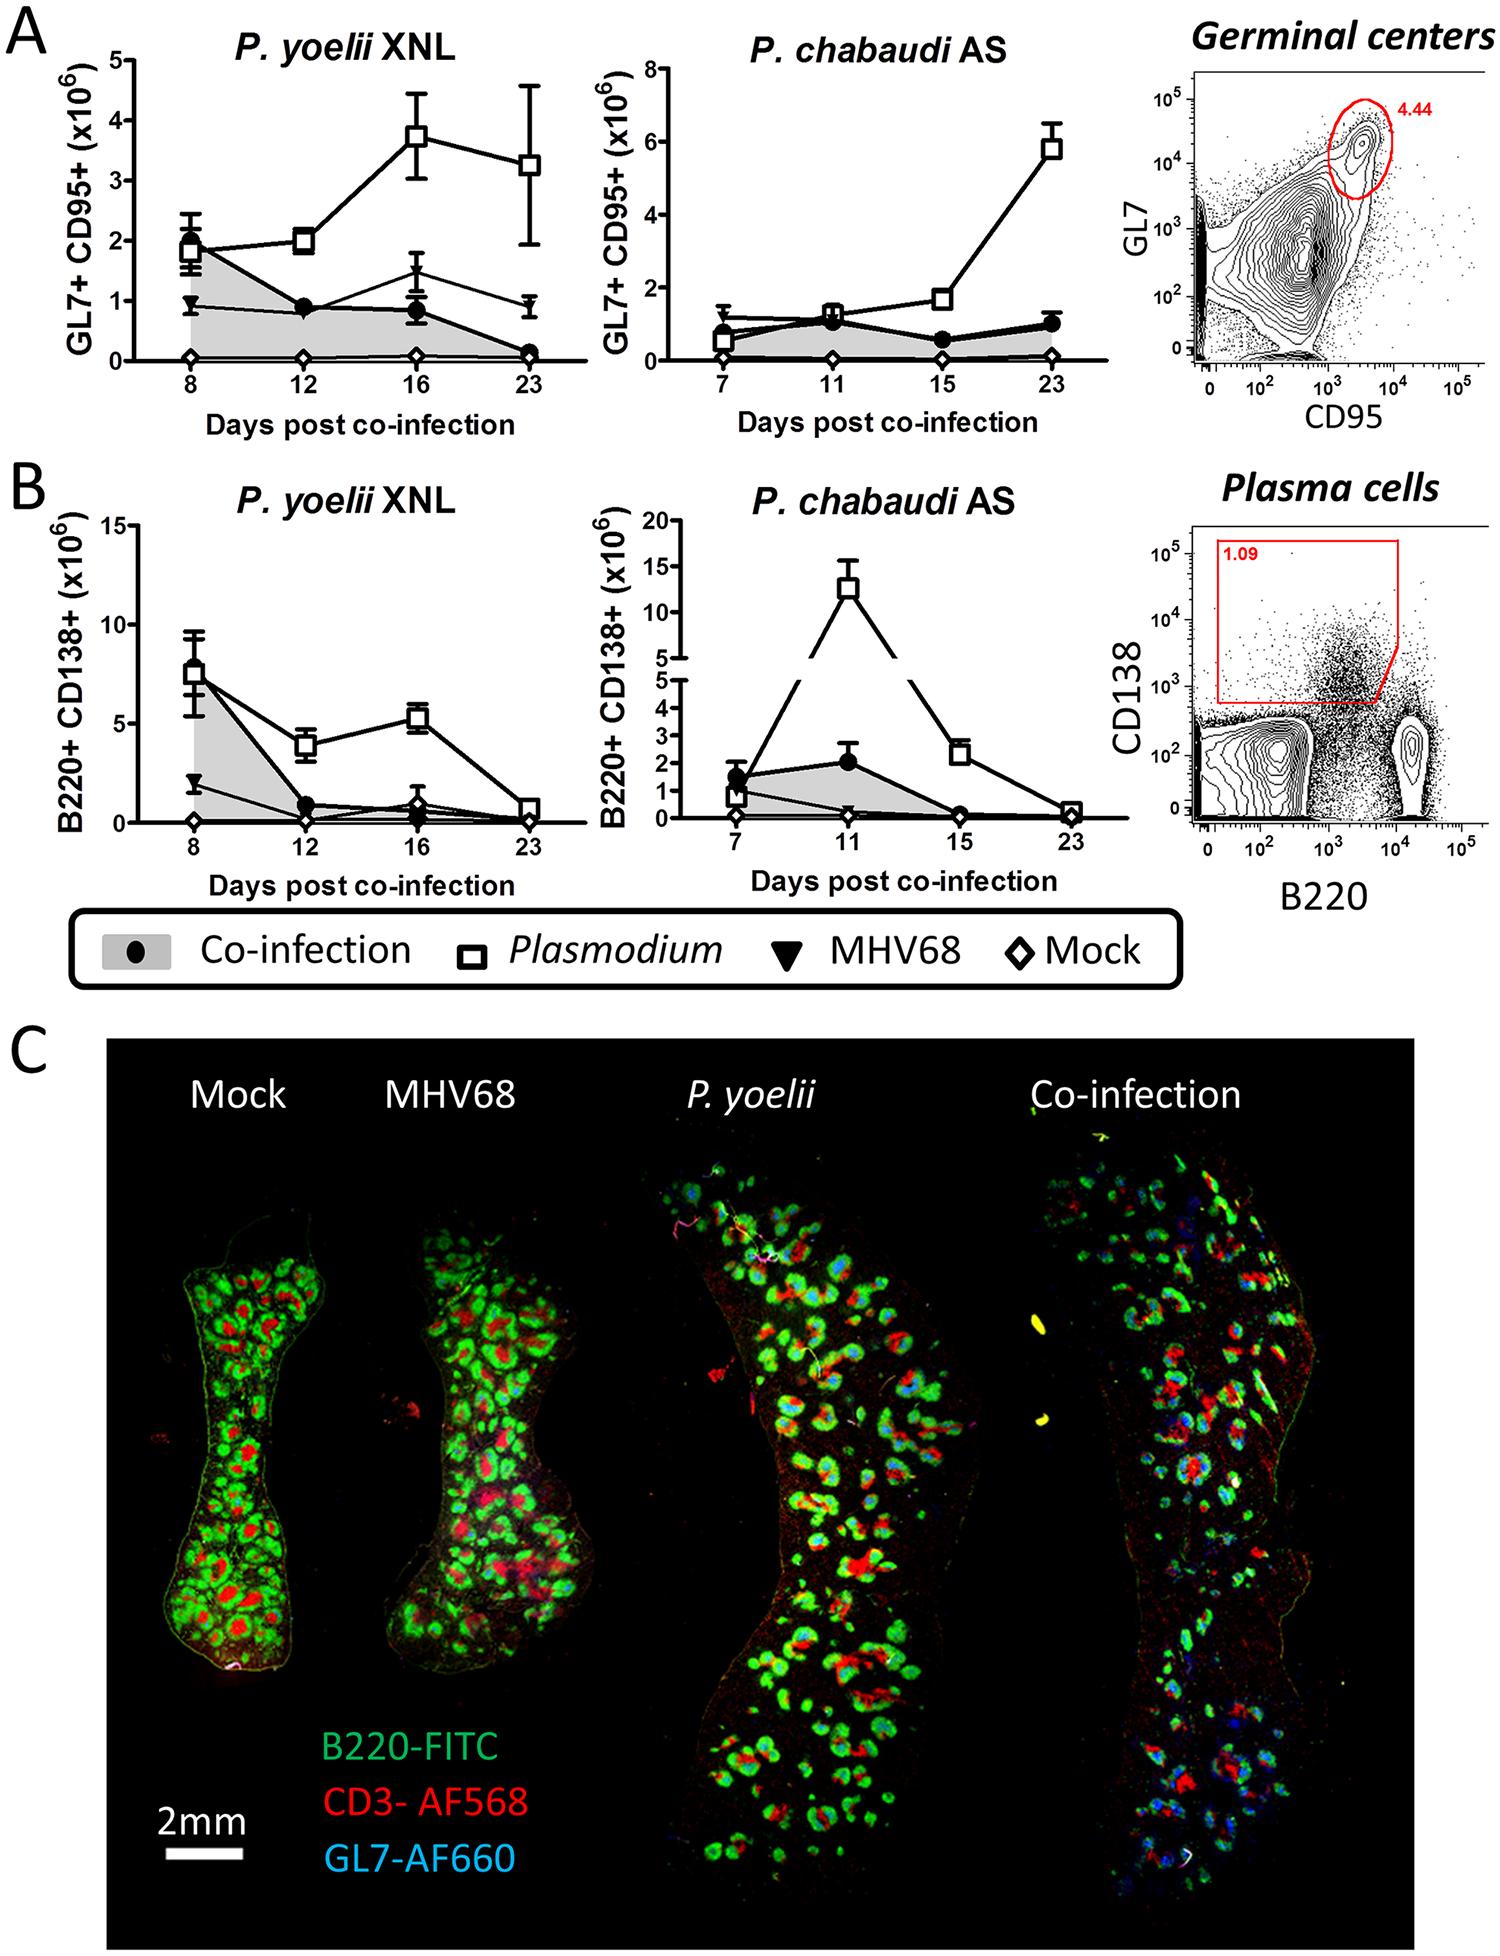 MHV68 suppresses splenic B cell responses during co-infection with <i>Plasmodium</i>.